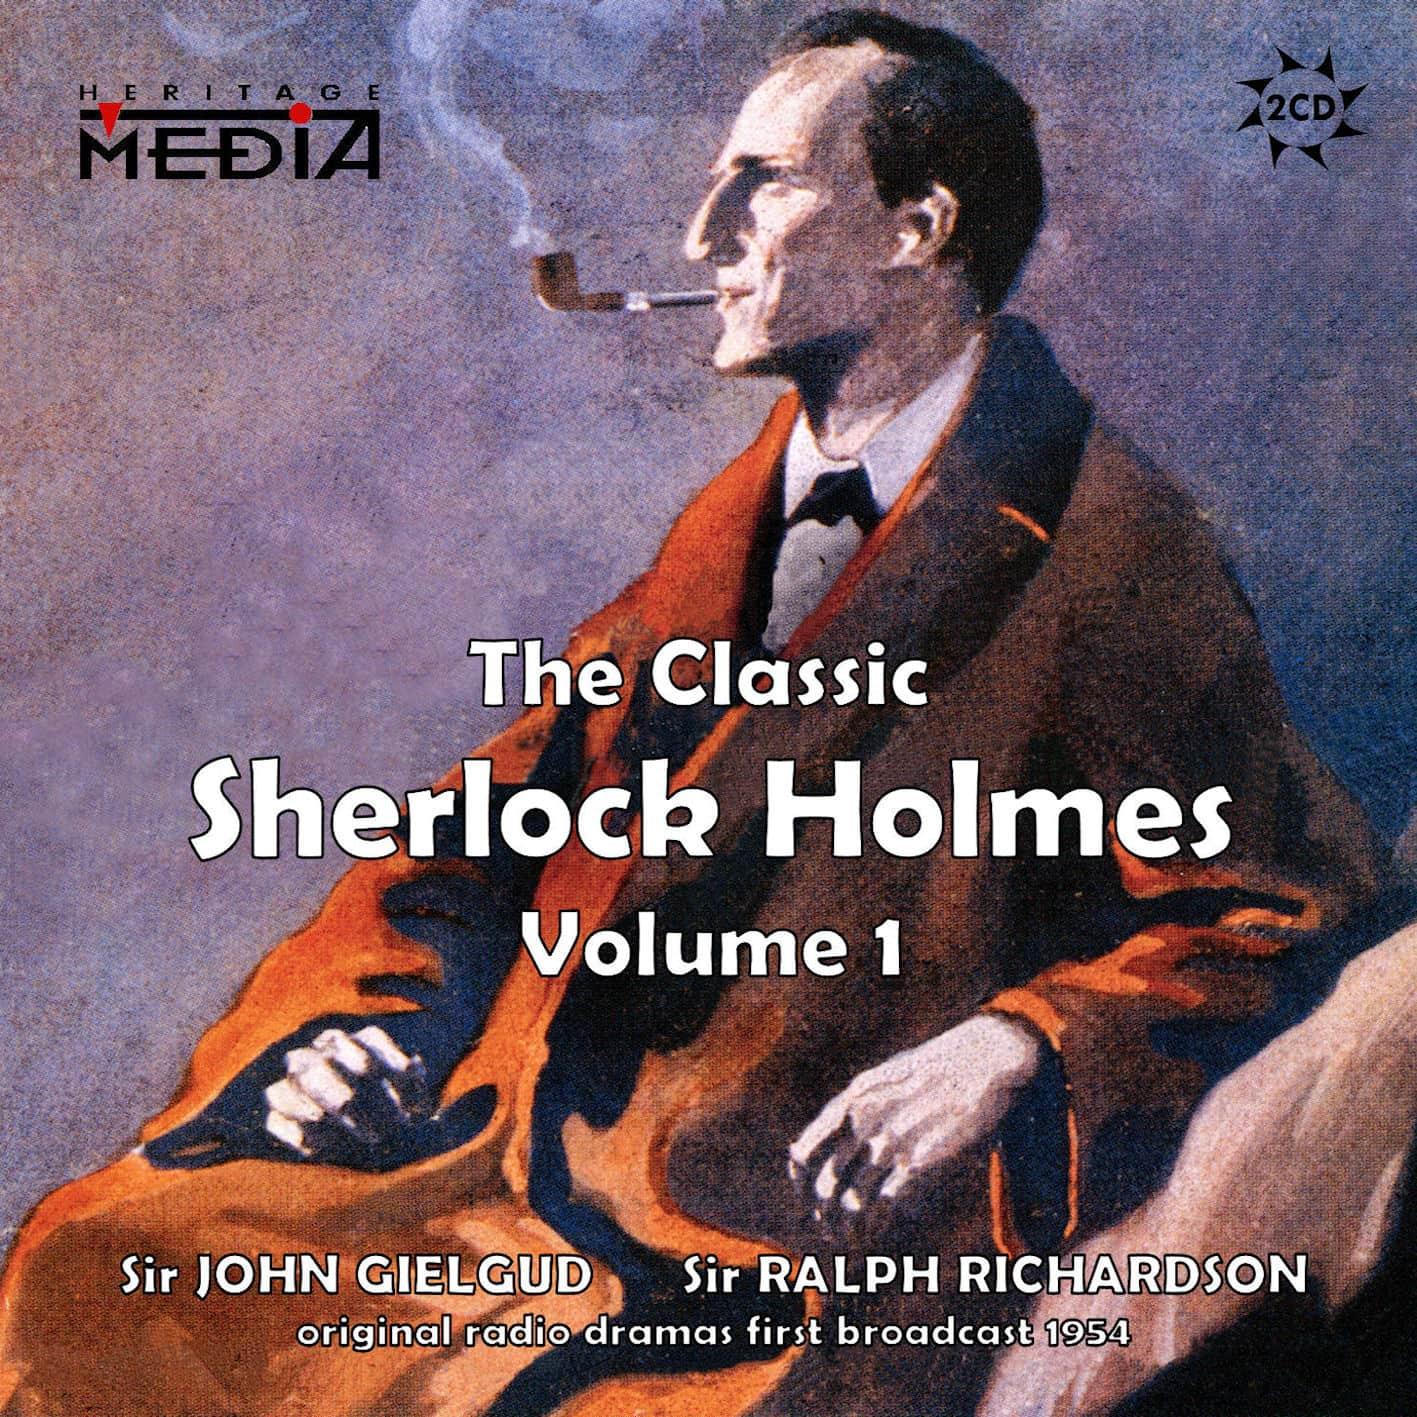 The Classic Sherlock Holmes, vol. 1 (2CD)